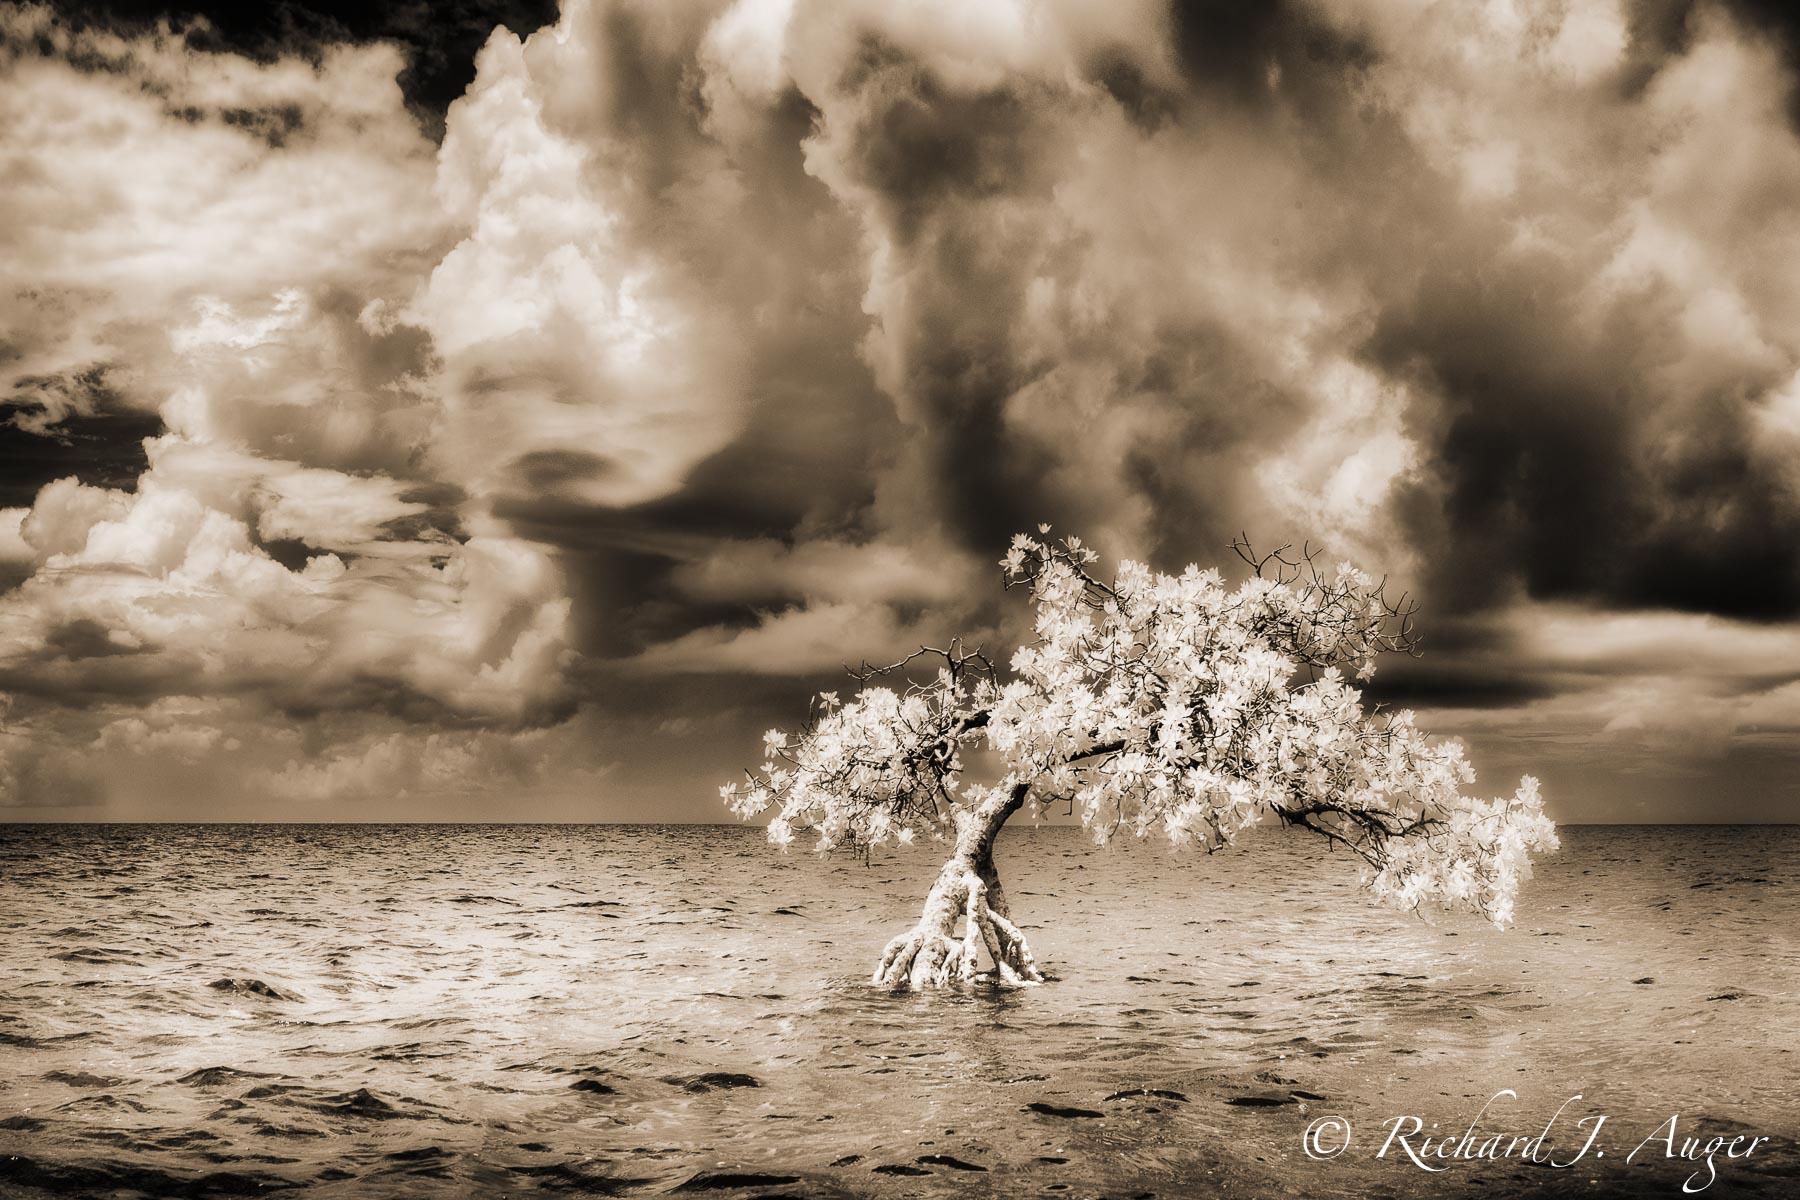 Long Mangrove State Park, Florida, Storm, Moody, Sepia, Monochrome, light, photograph, photographer, water, landscape